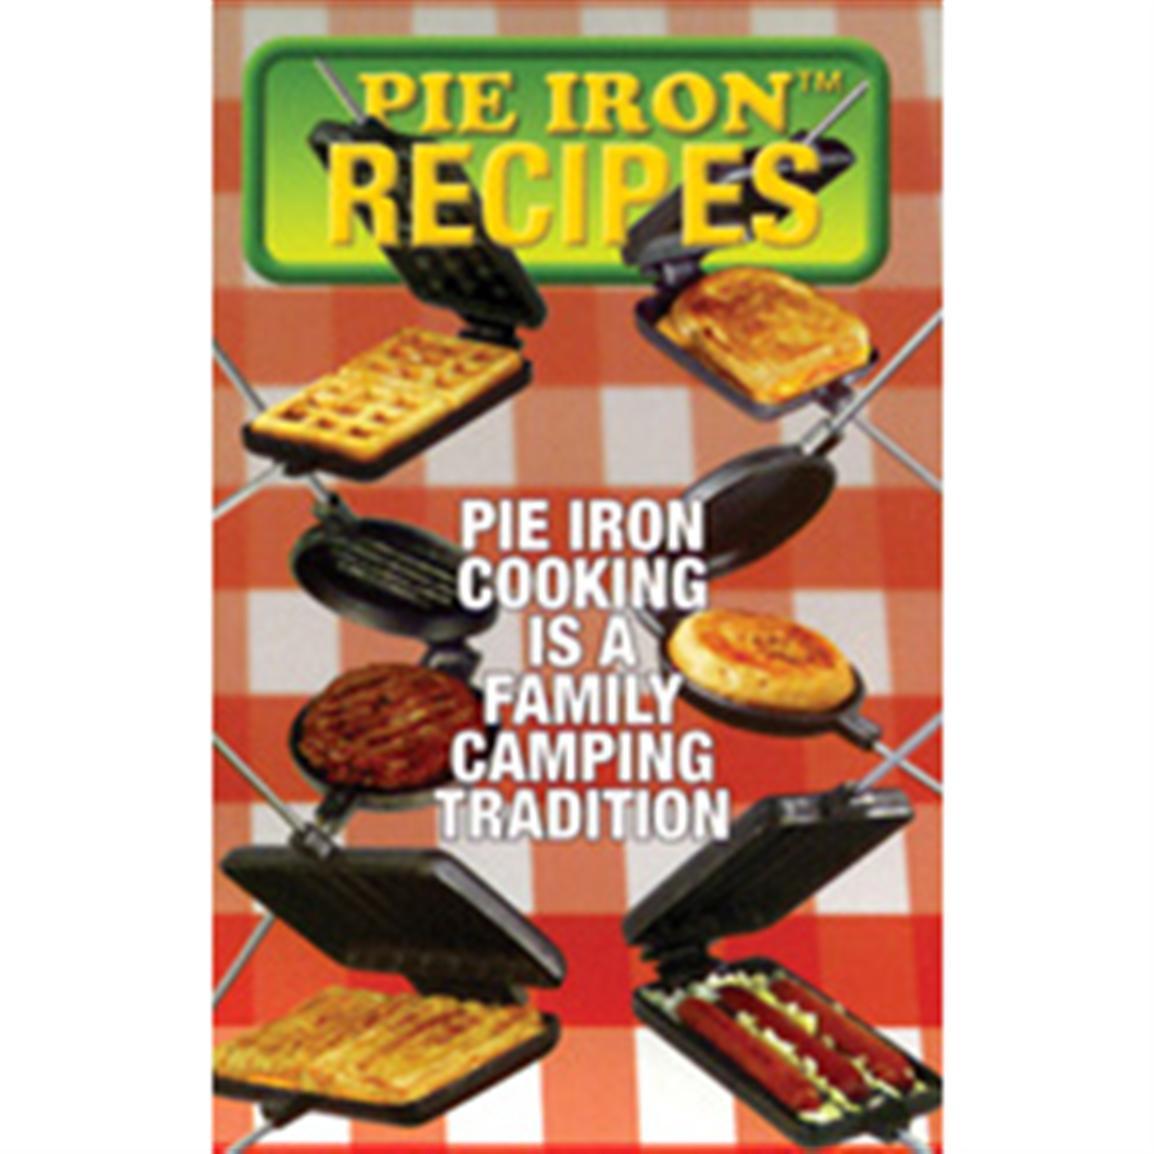 Pie Iron Recipes Camping  Rome Pie Iron Recipe Book RV Kitchen at